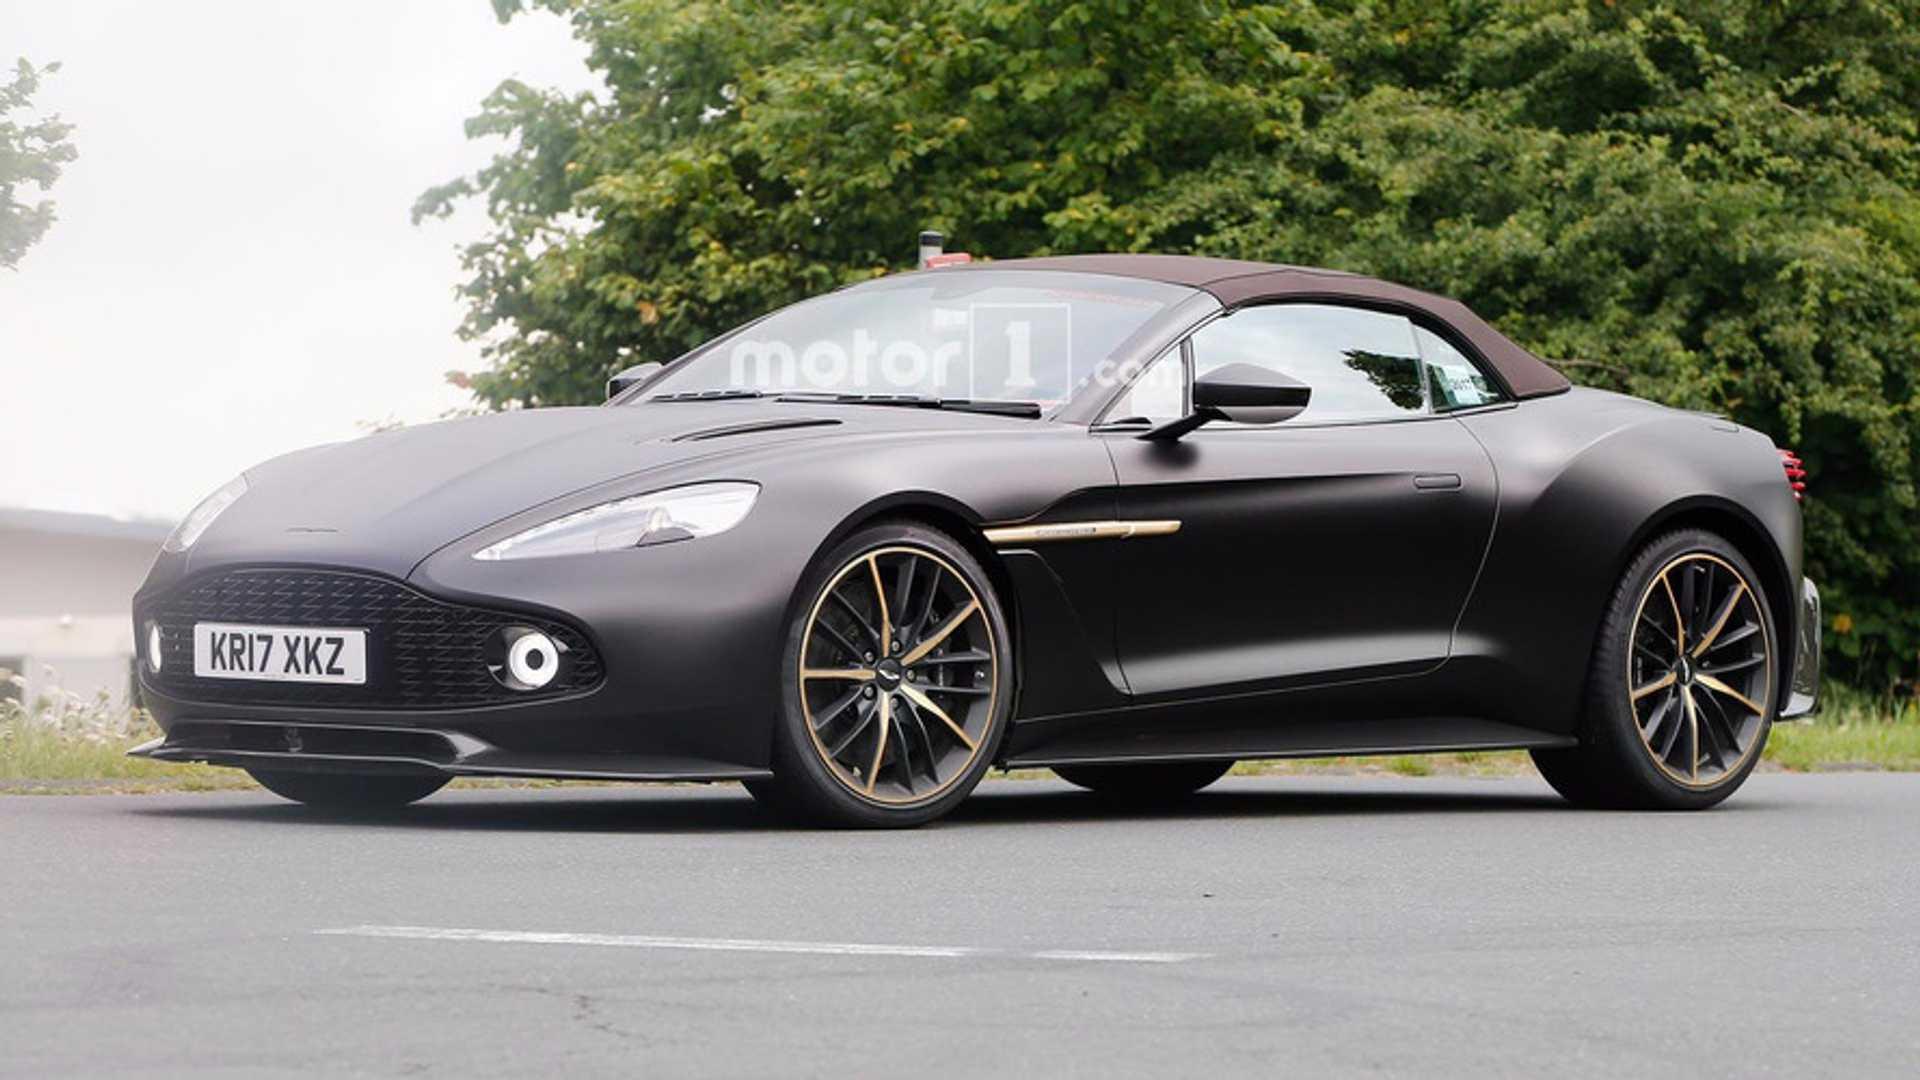 Aston Martin Vanquish Zagato Volante Spied In Elegant Satin Black